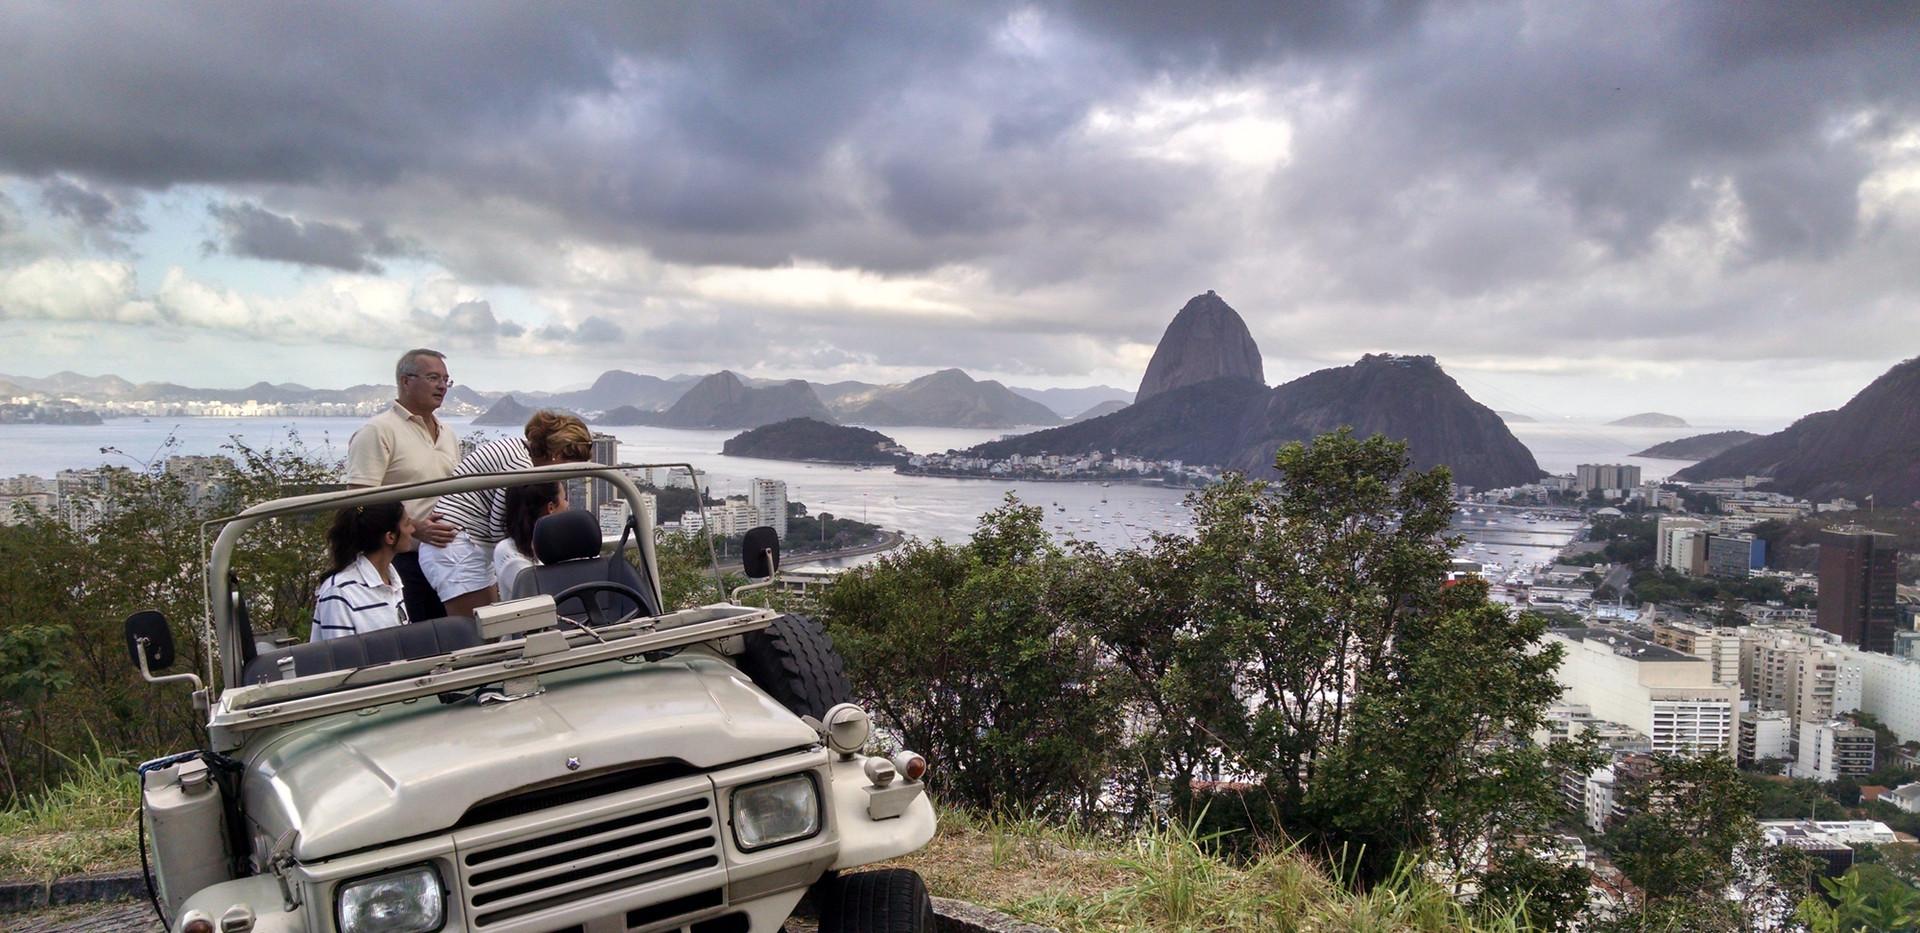 Visita a favela Santa Marta 2